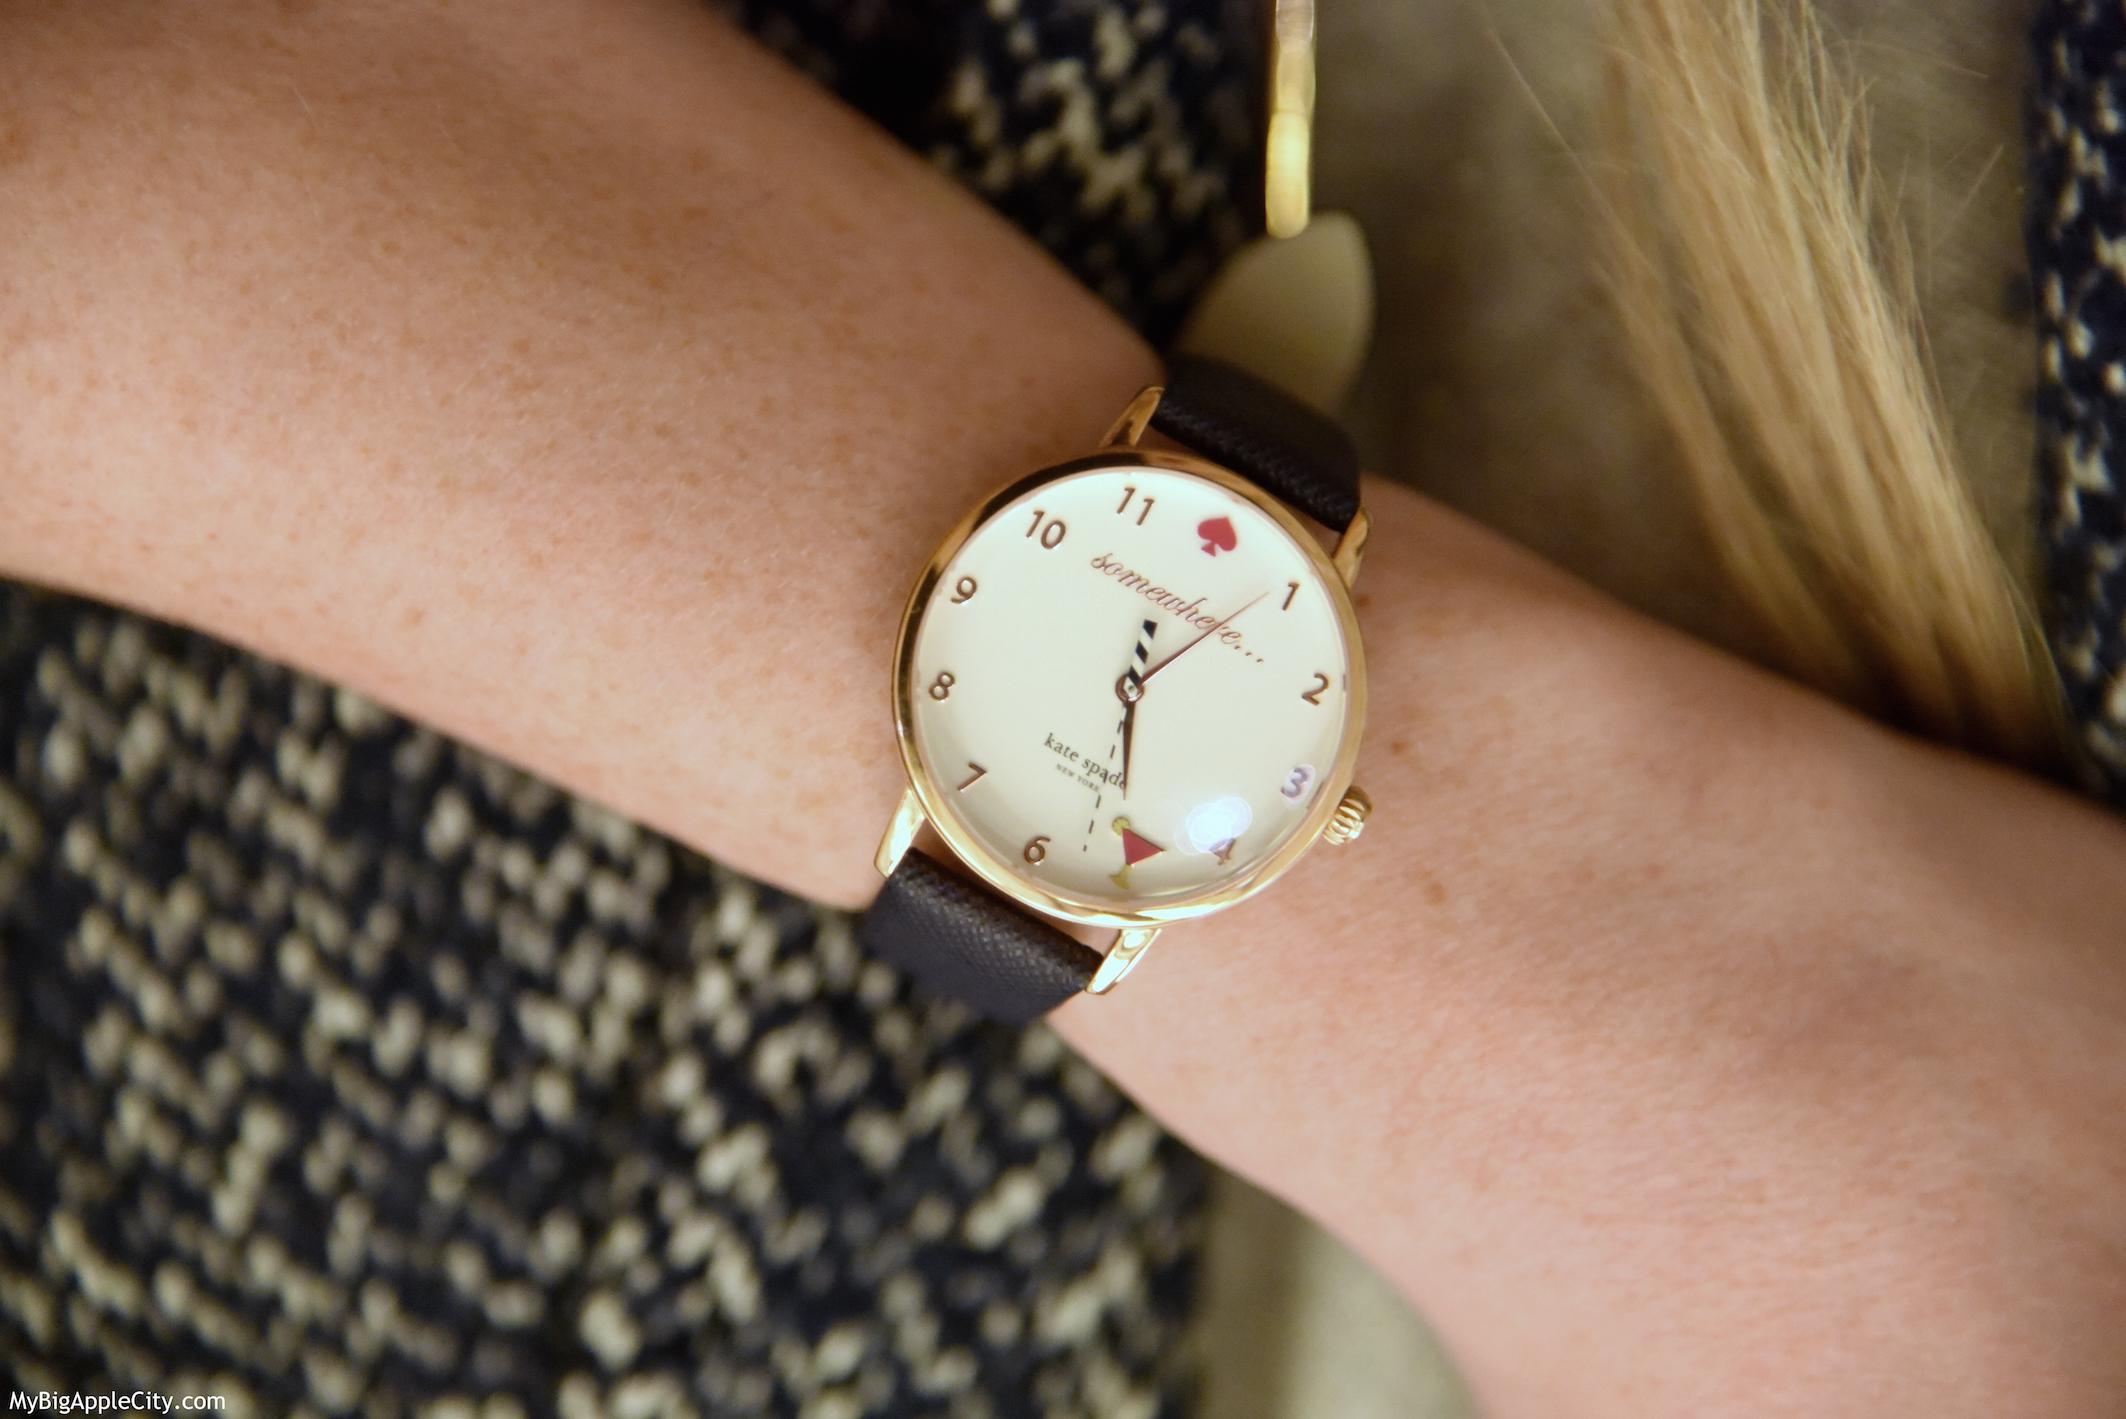 Kate-Spade-New-York-Watch-Fashion-Blogger-NYC-Mybigapplecity